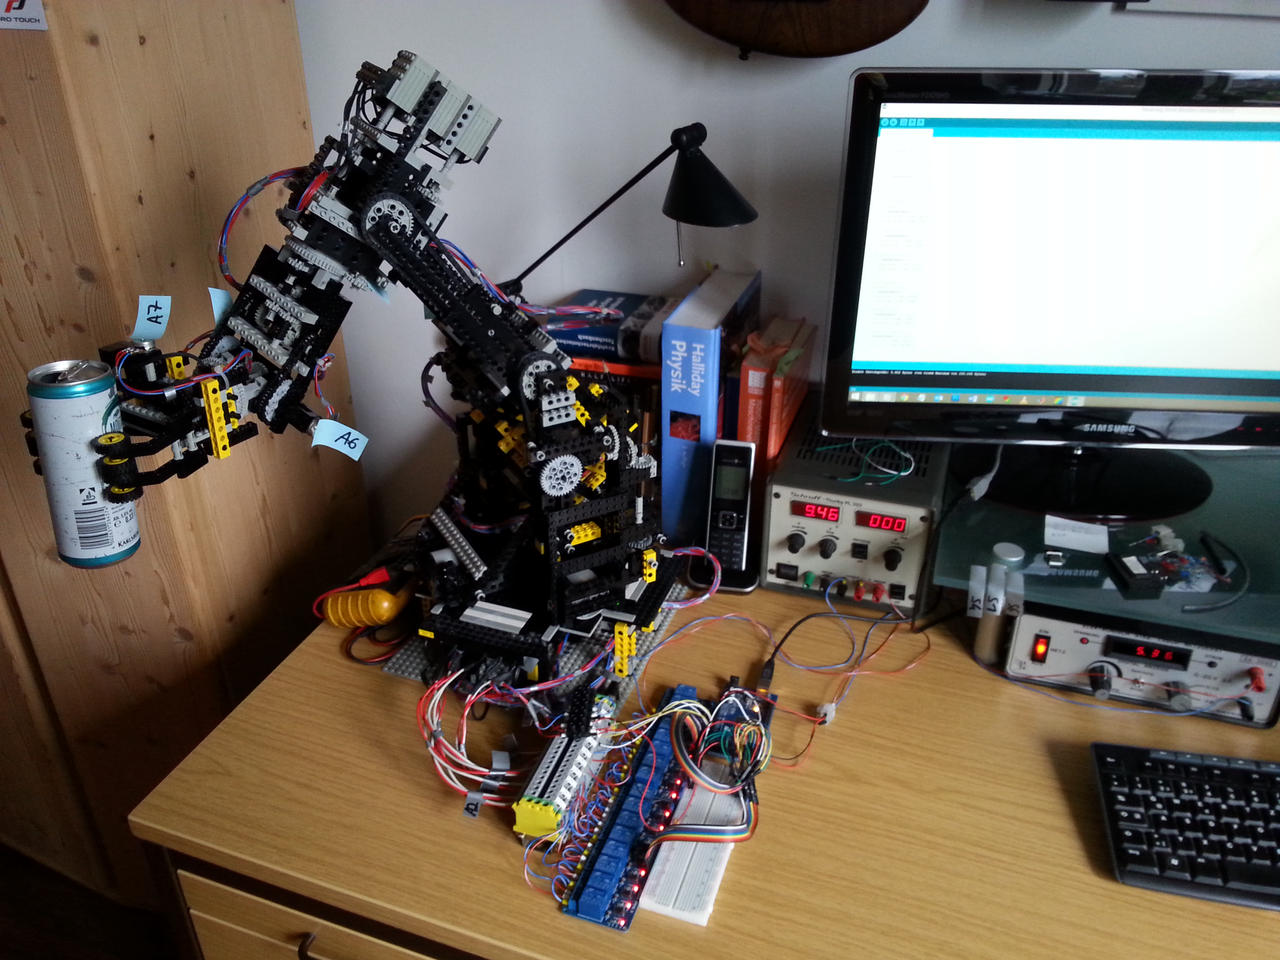 Arduino Controlled 6 Axes Lego Robot By Hausmann On Deviantart